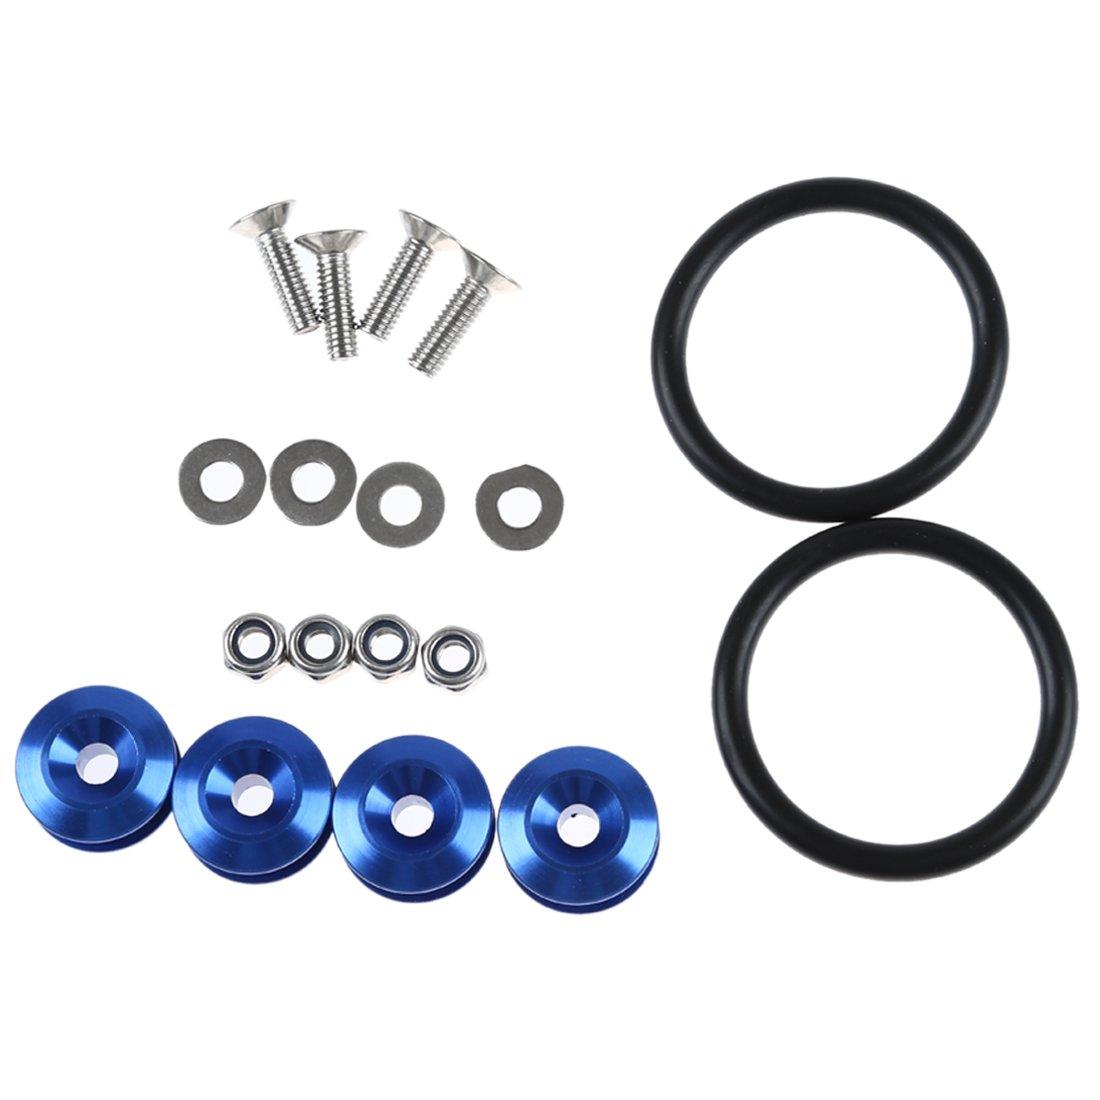 Herraminta - SODIAL(R)Conjunto de anillo de lazo de perno de liberacion rapida de JDM Pegatina Fender Tronco de fijacion de tornillos azul 59208A1